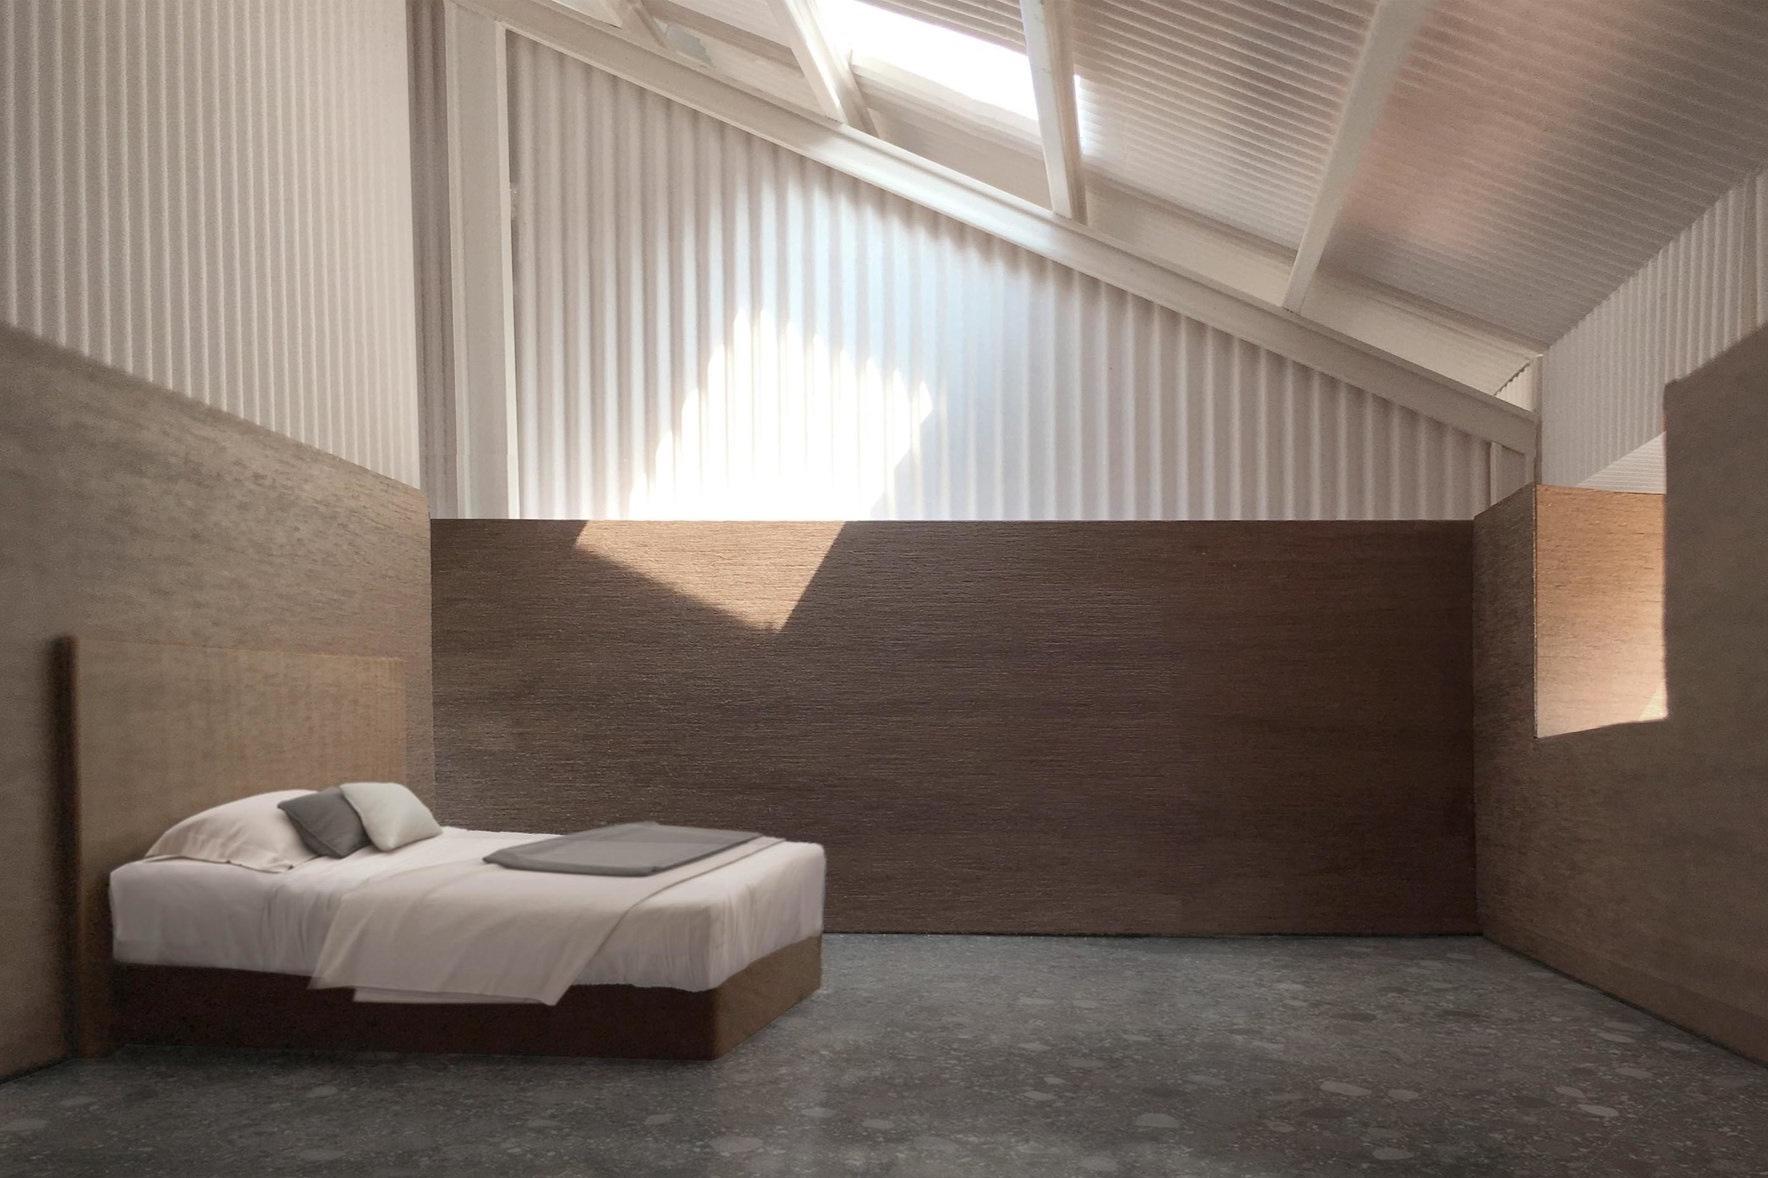 bindloss-dawes-class-Q-barn-02.jpg